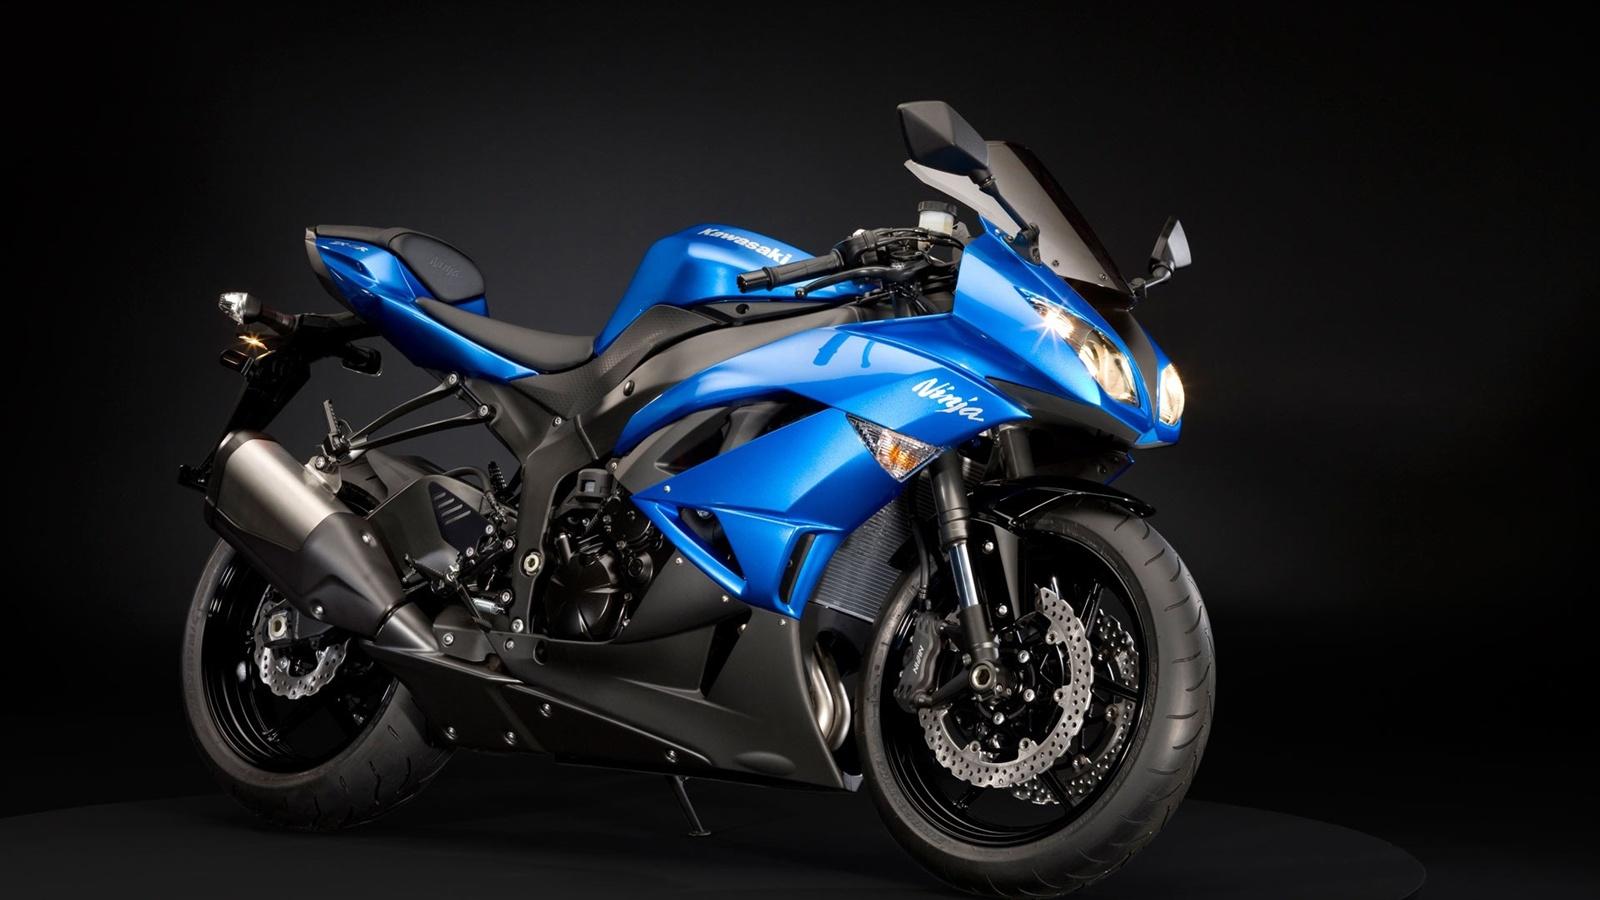 Wallpaper Kawasaki Ninja Zx 6r Motorcycle Blue 19x10 Hd Picture Image